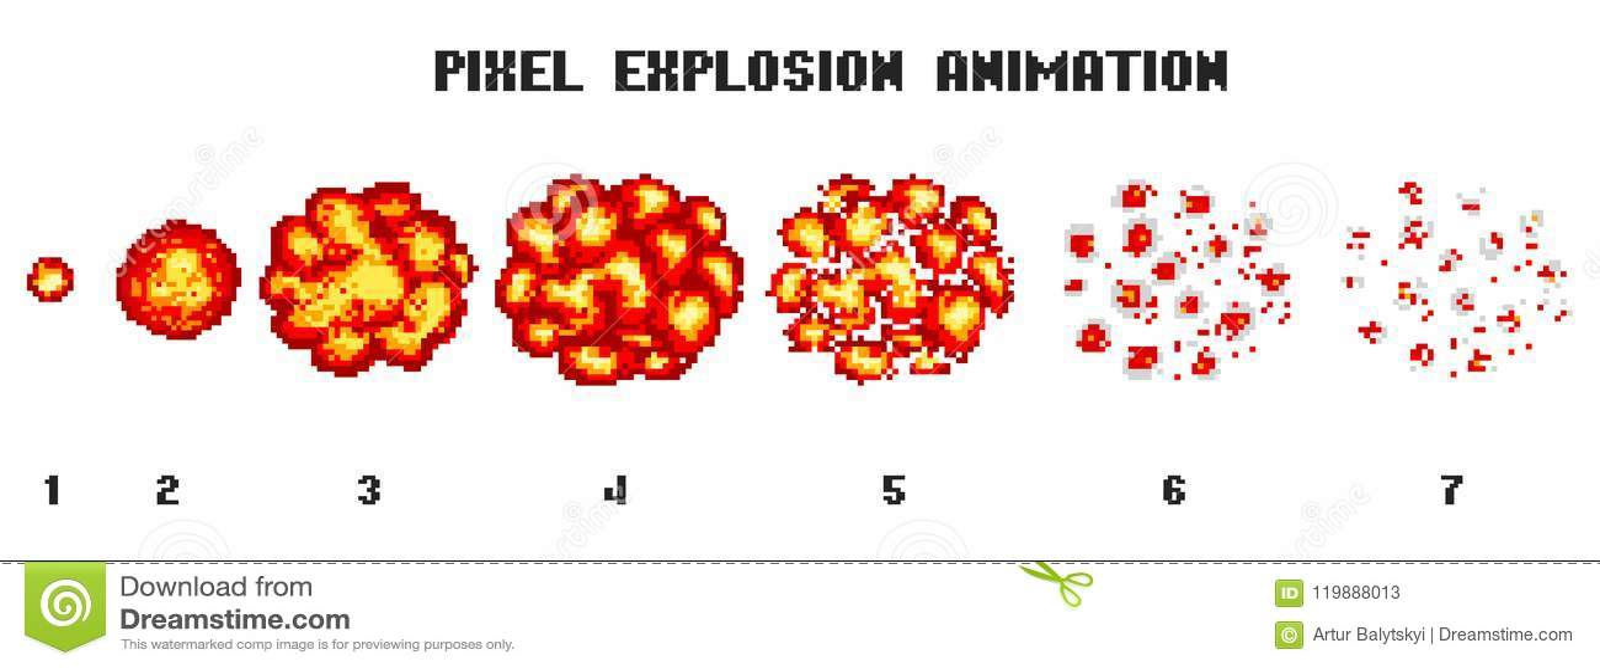 Explosions Dart De Pixel Icônes De Jeu Réglées Effets